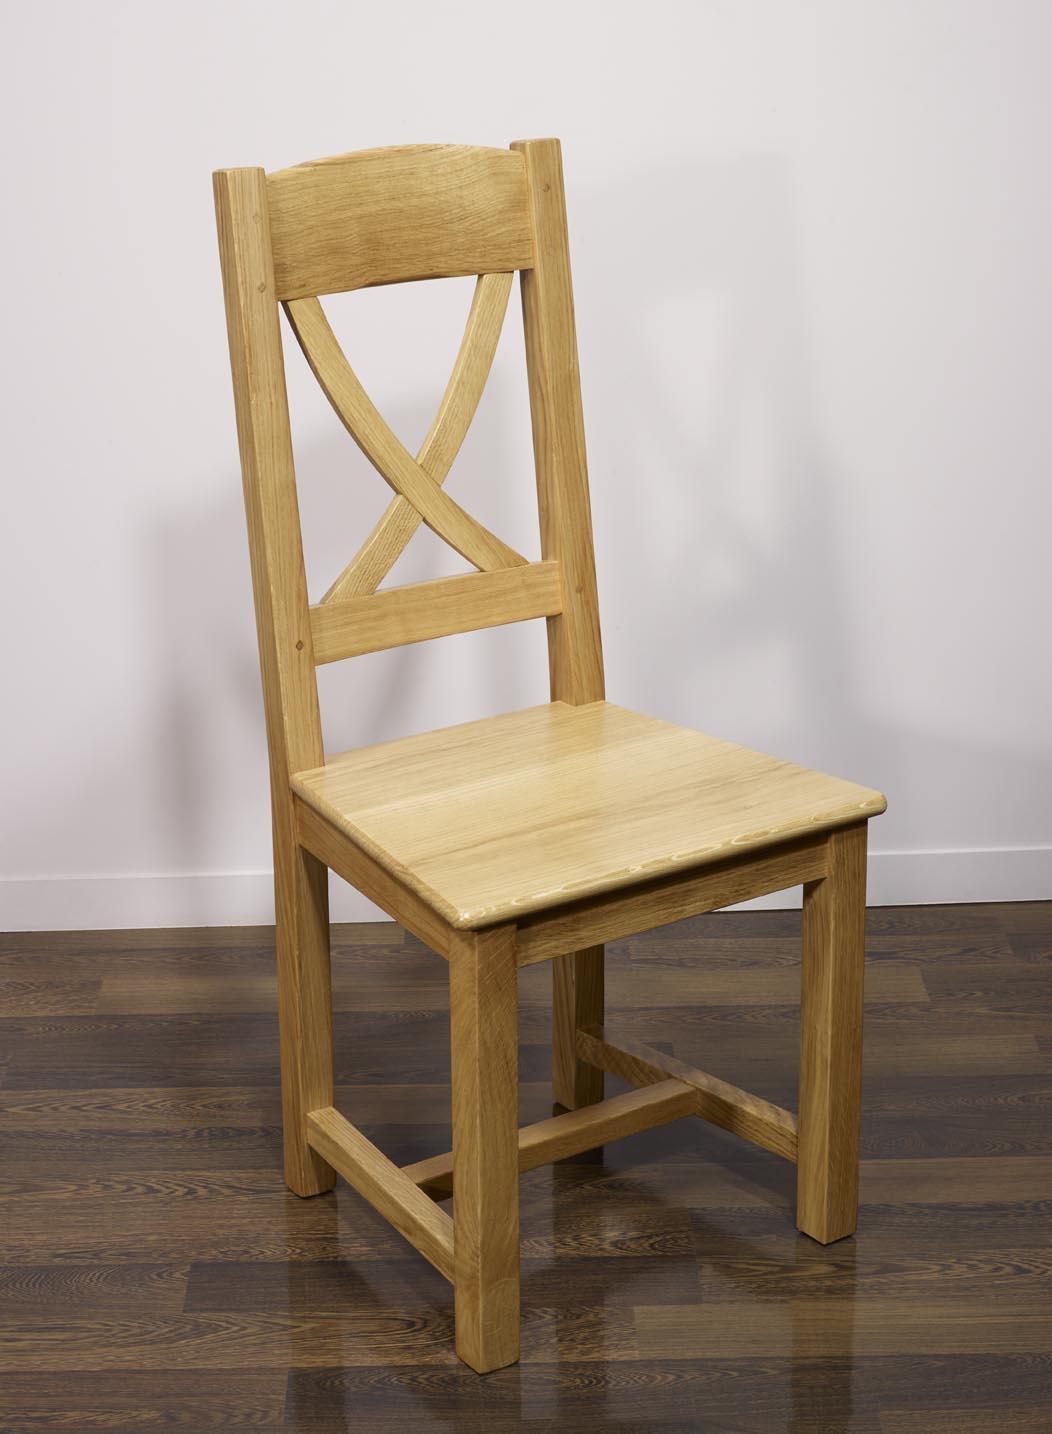 chaise olivier en ch ne massif de style campagne assise ch ne meuble en ch ne massif. Black Bedroom Furniture Sets. Home Design Ideas